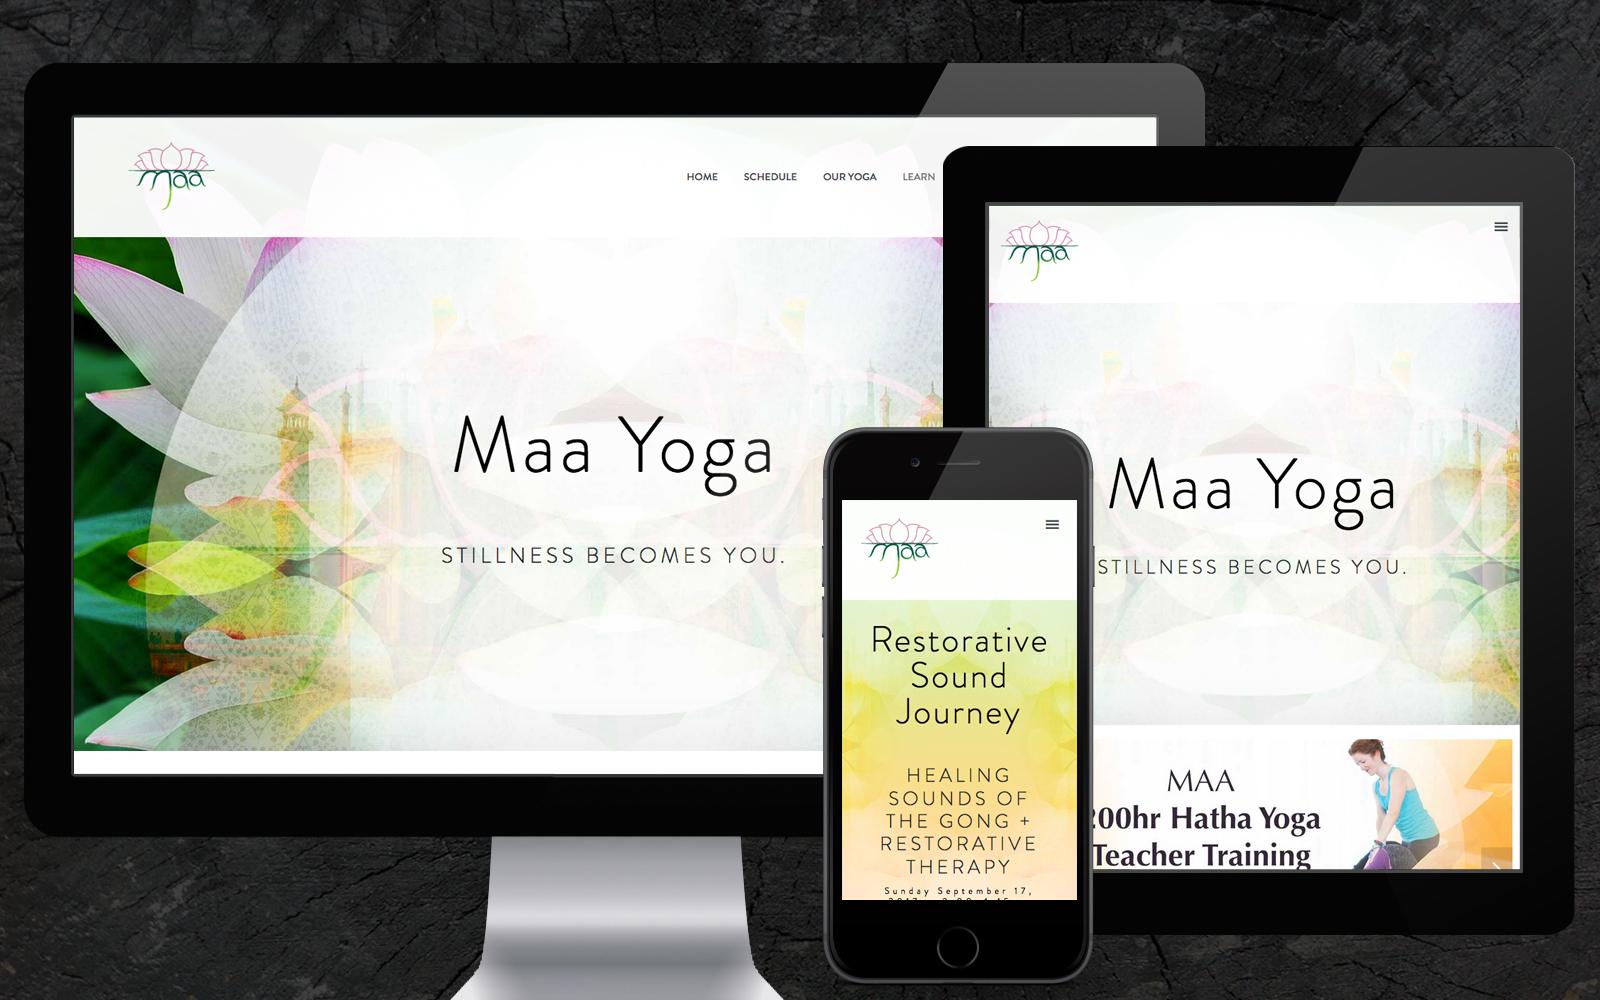 MaaYoga.com 2017